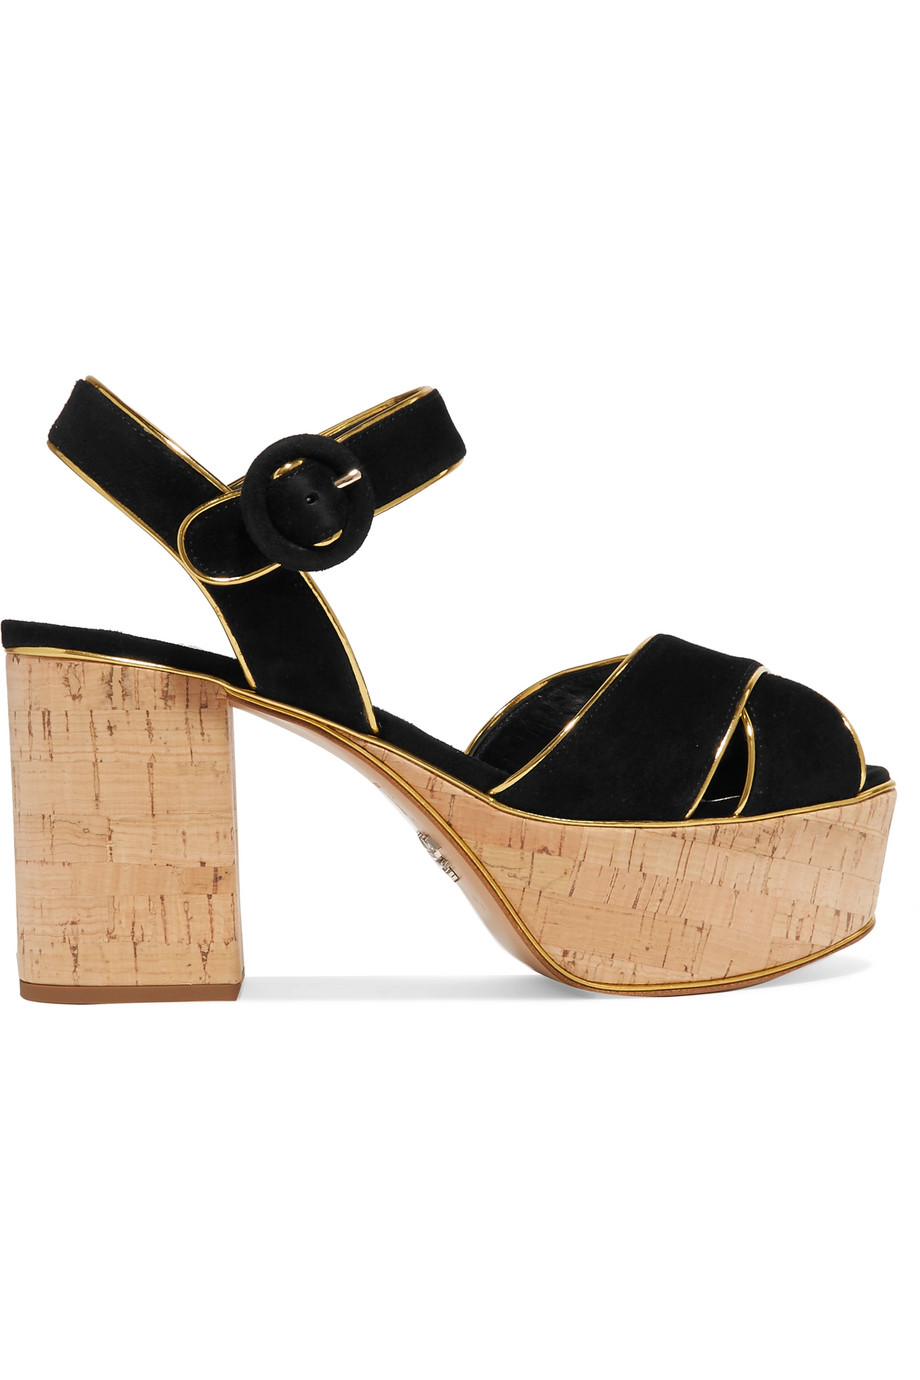 4c86c8abd Prada Metallic leather-trimmed suede platform sandals at Net-A-Porter